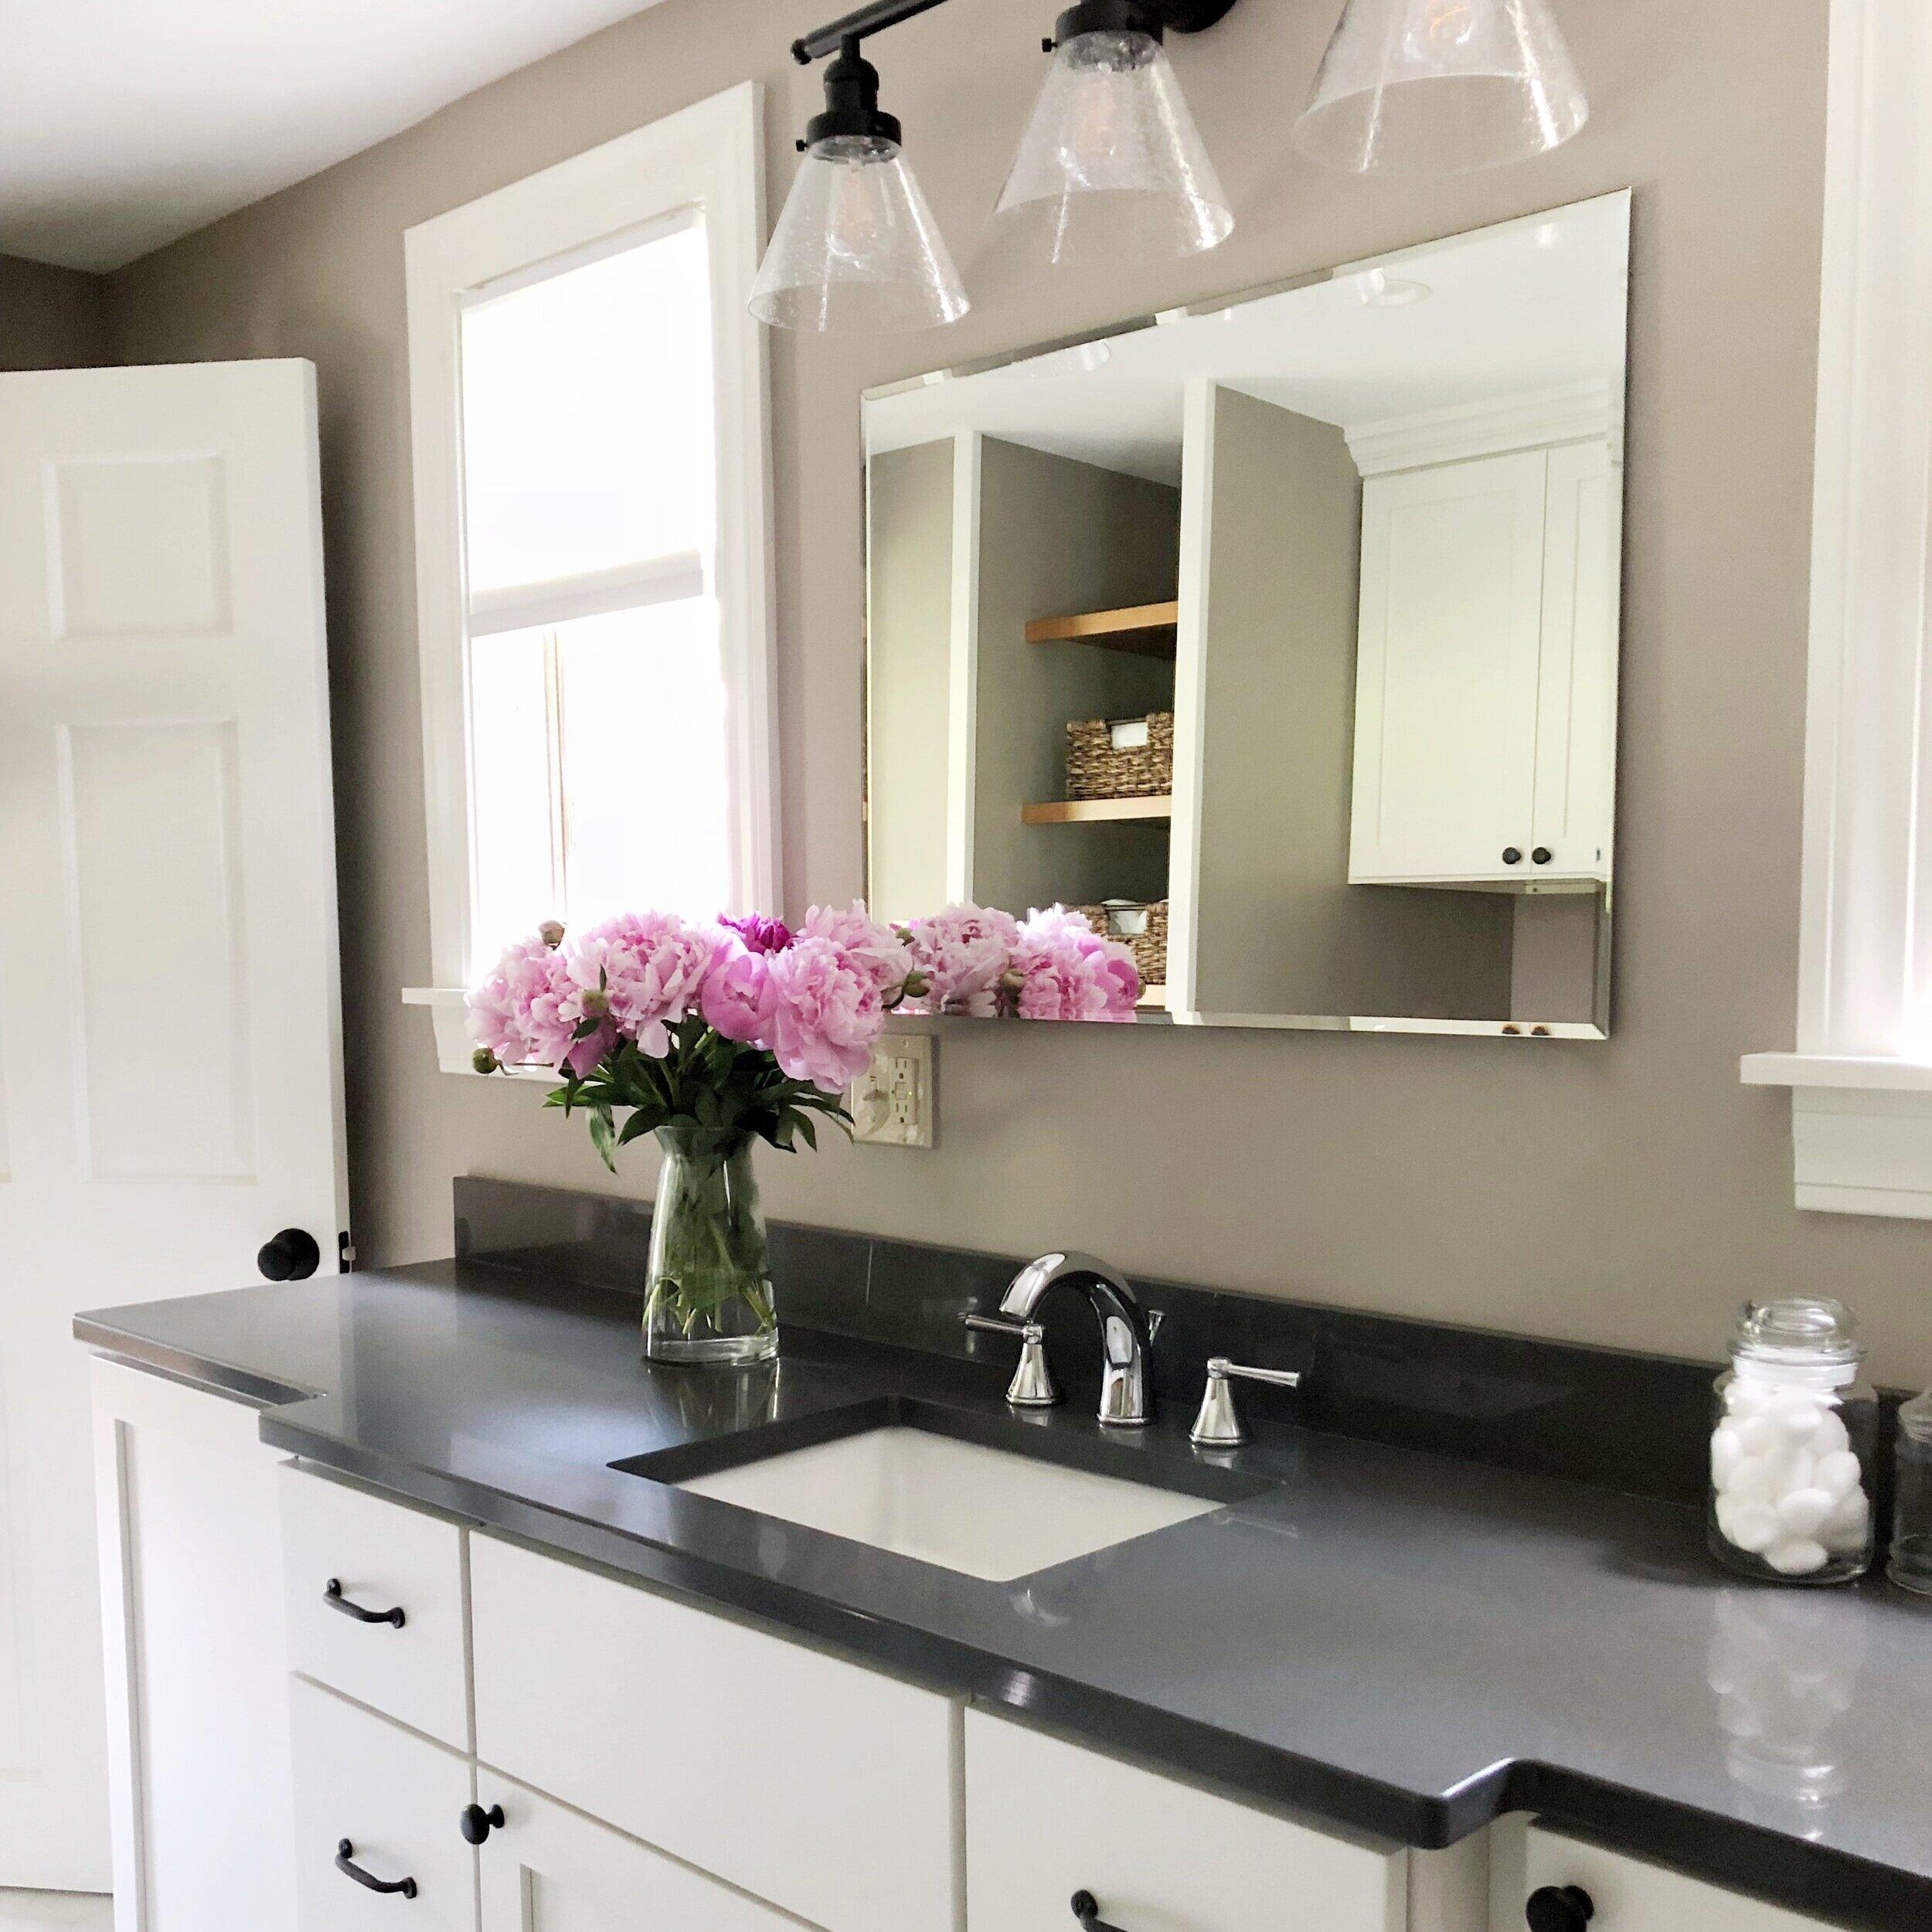 Maple Street - Bath & Laundry Room Remodel